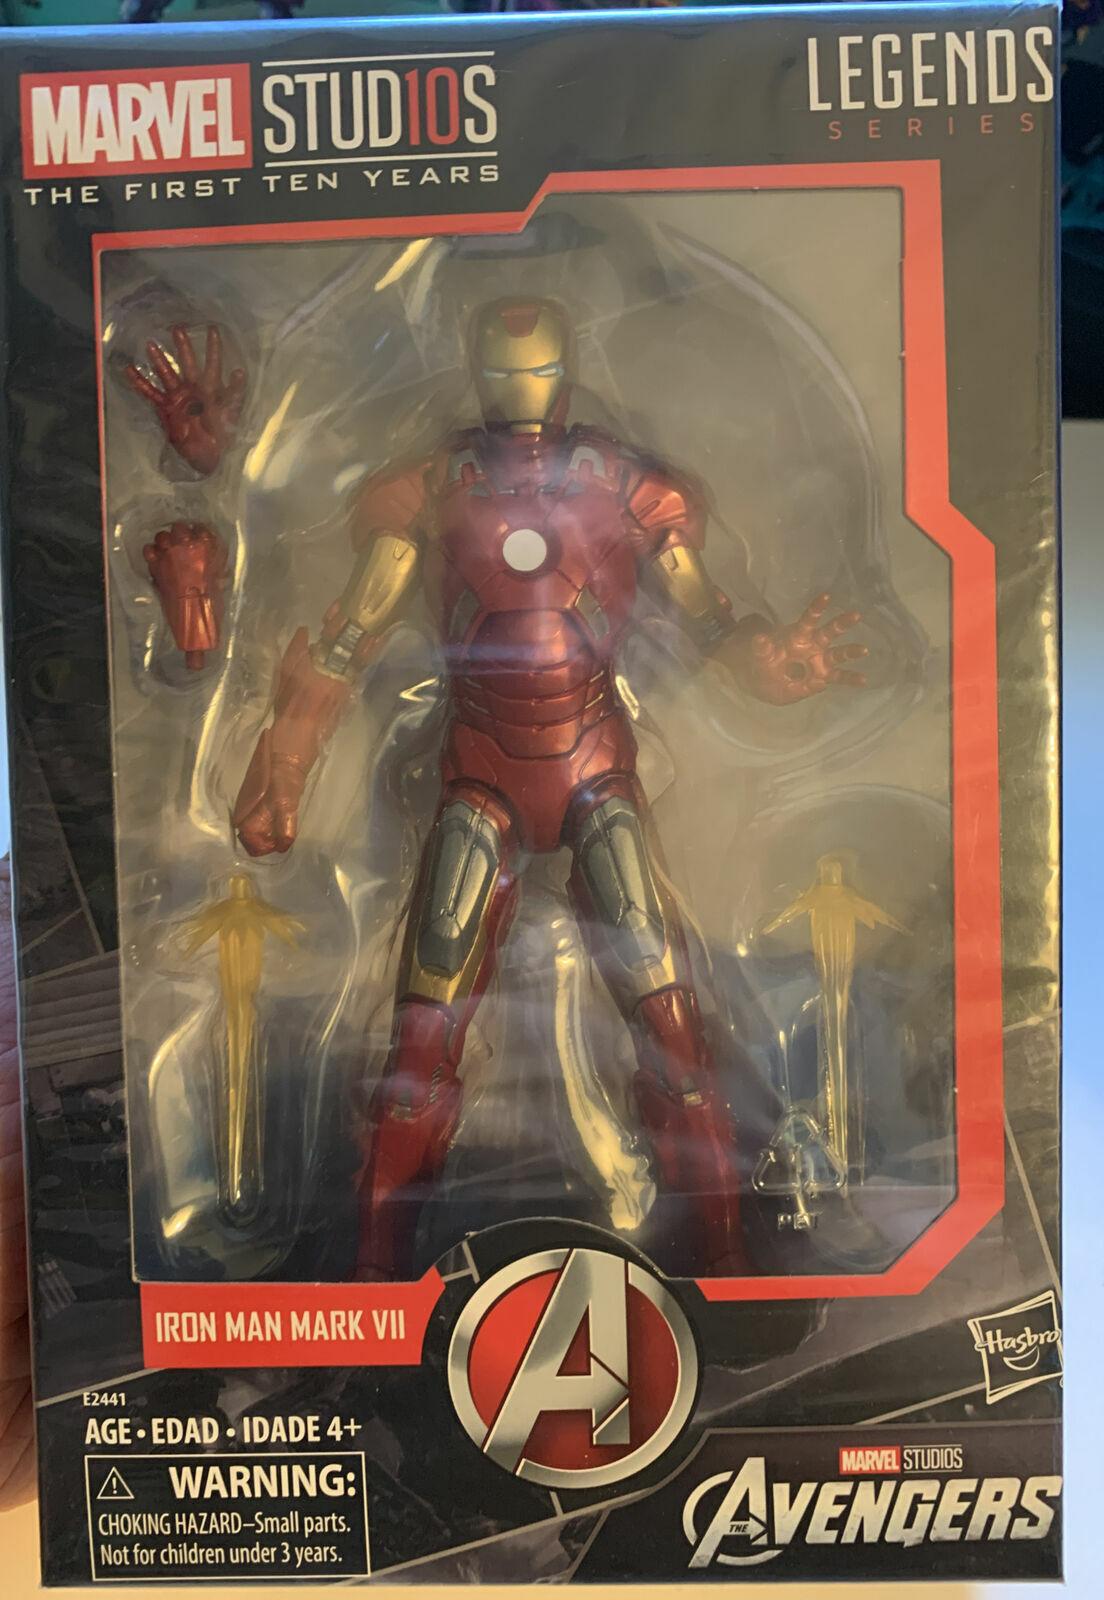 Hasbro Marvel Legends Studios First Ten Years Avengers Iron Man Mark VII #3 on eBay thumbnail